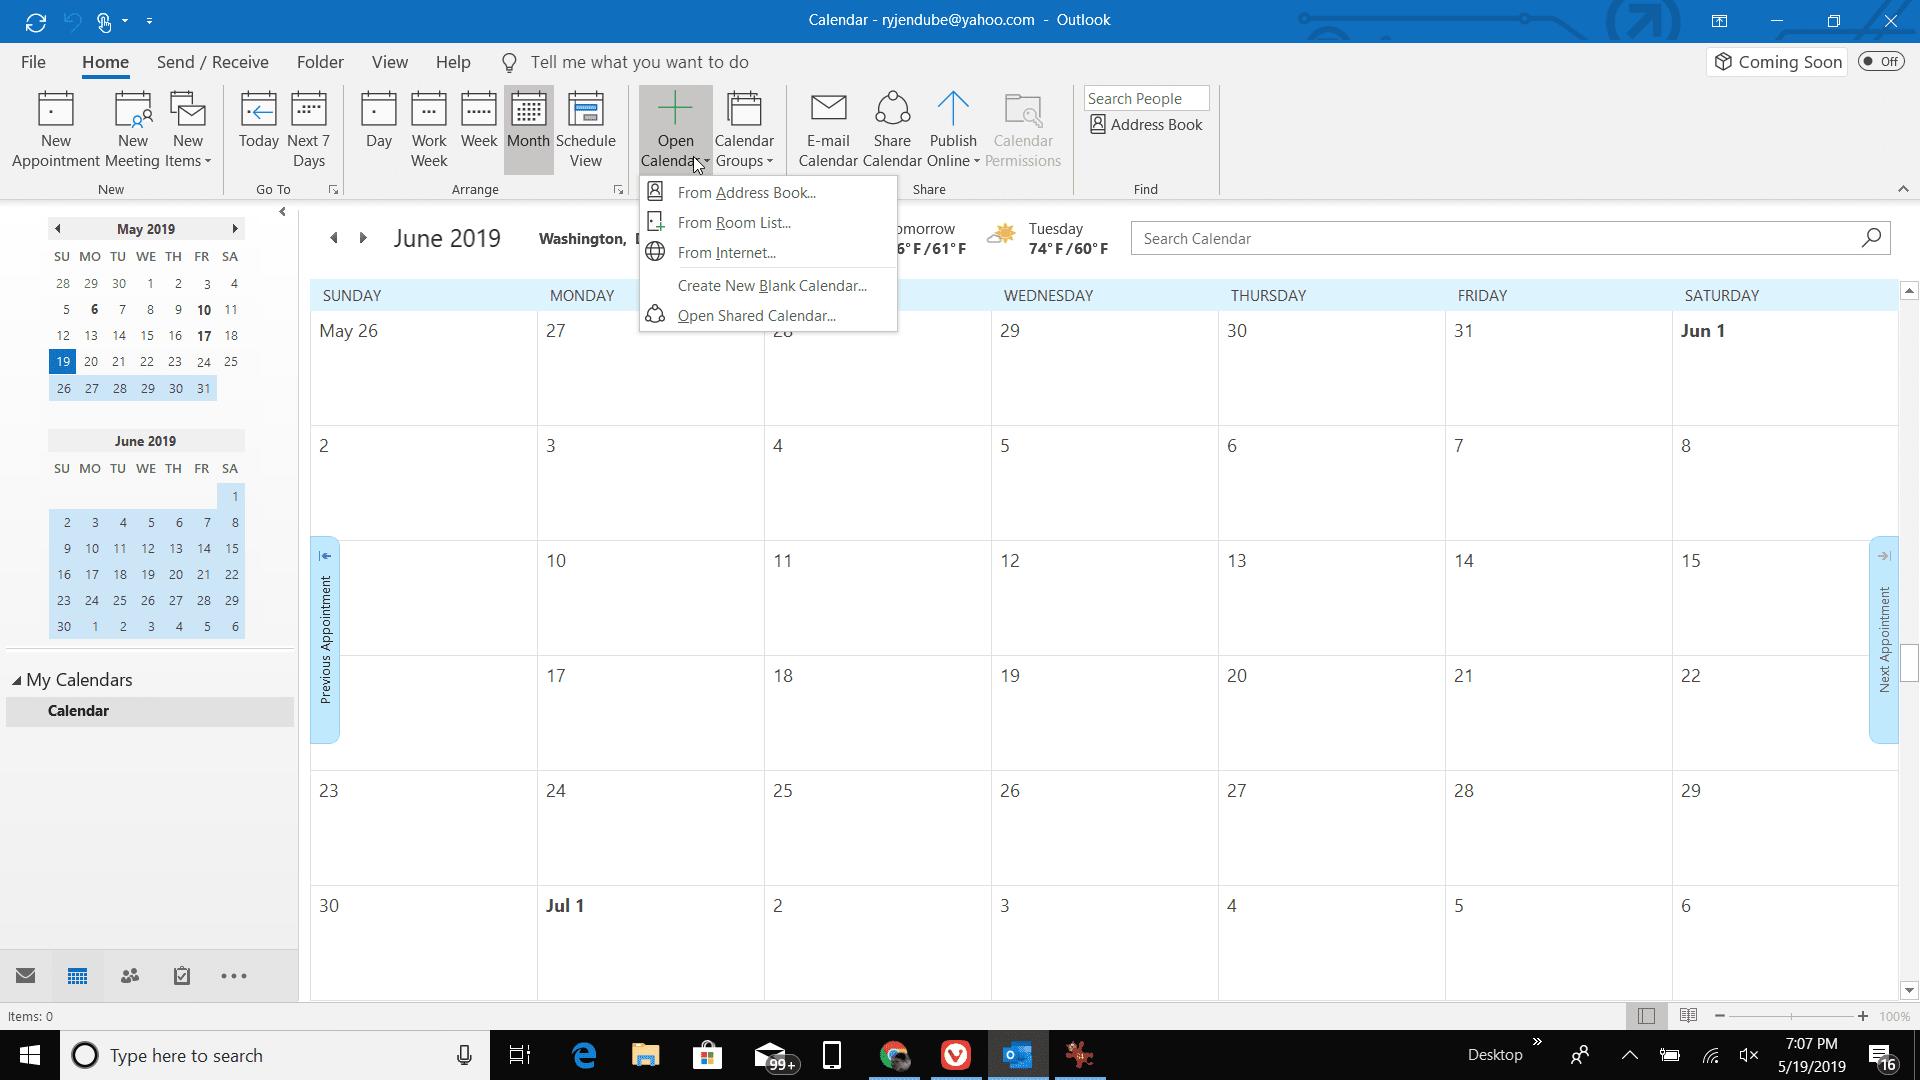 How to Get Google Calendar on Your Windows Desktop